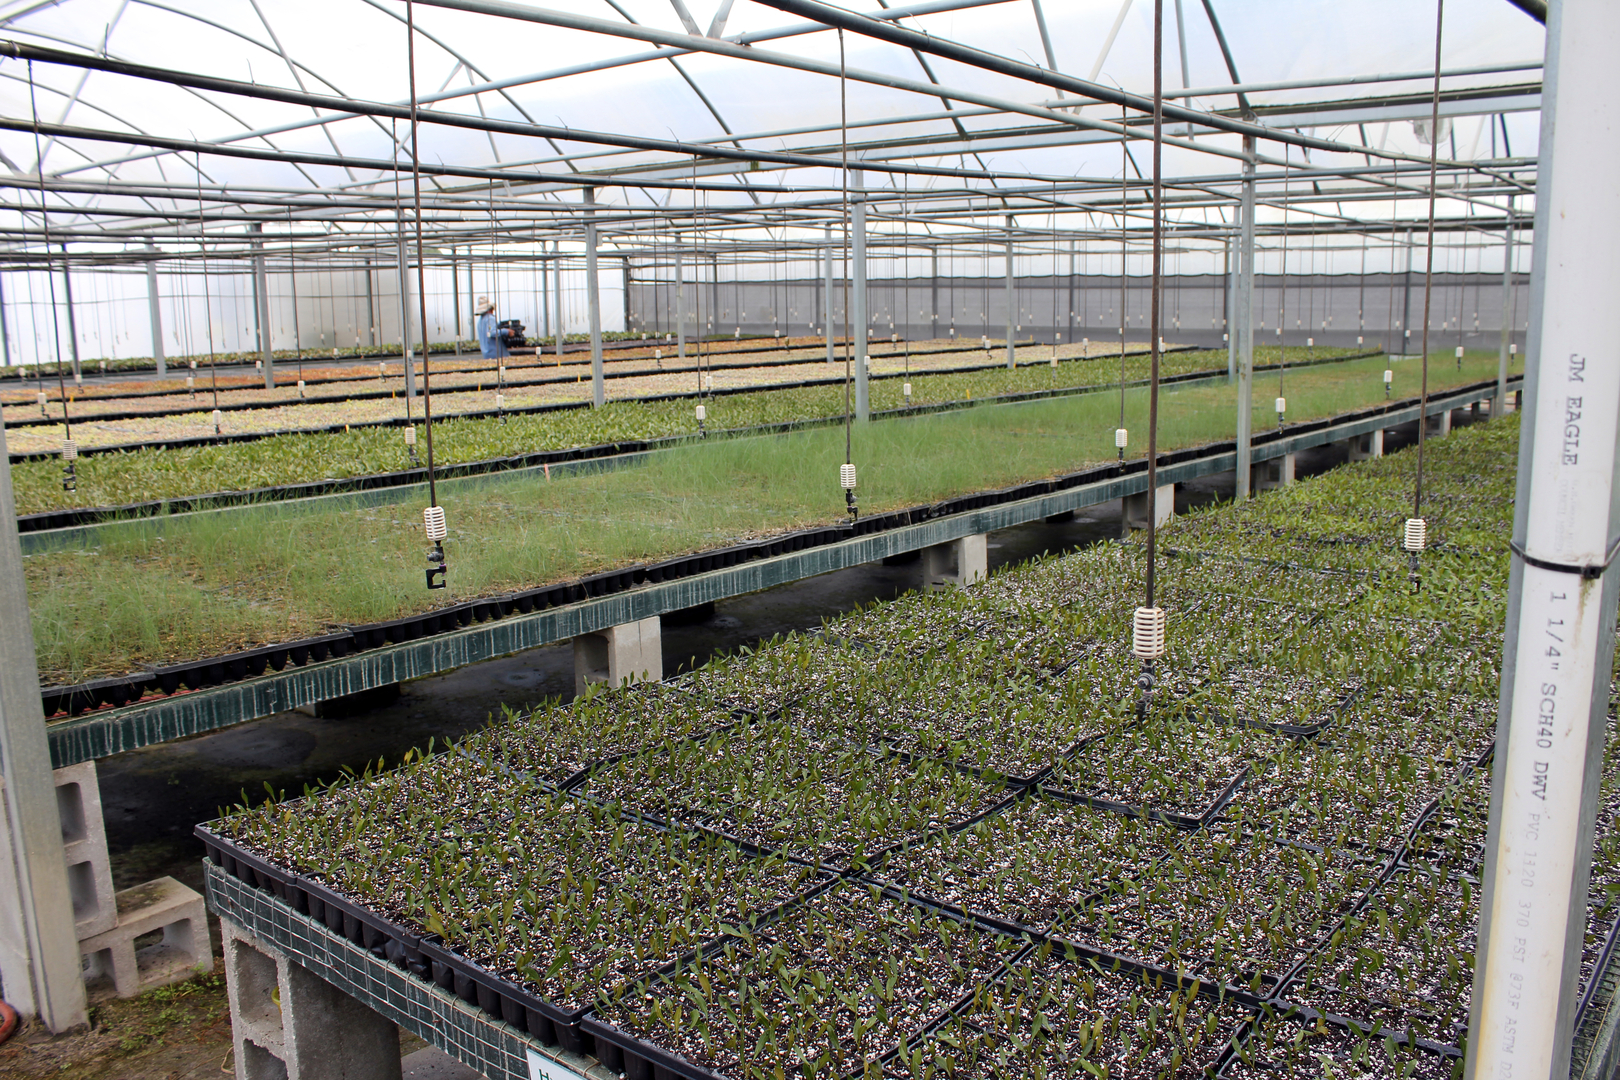 The greenhouse dallas tx - The Greenhouse Dallas Tx 36